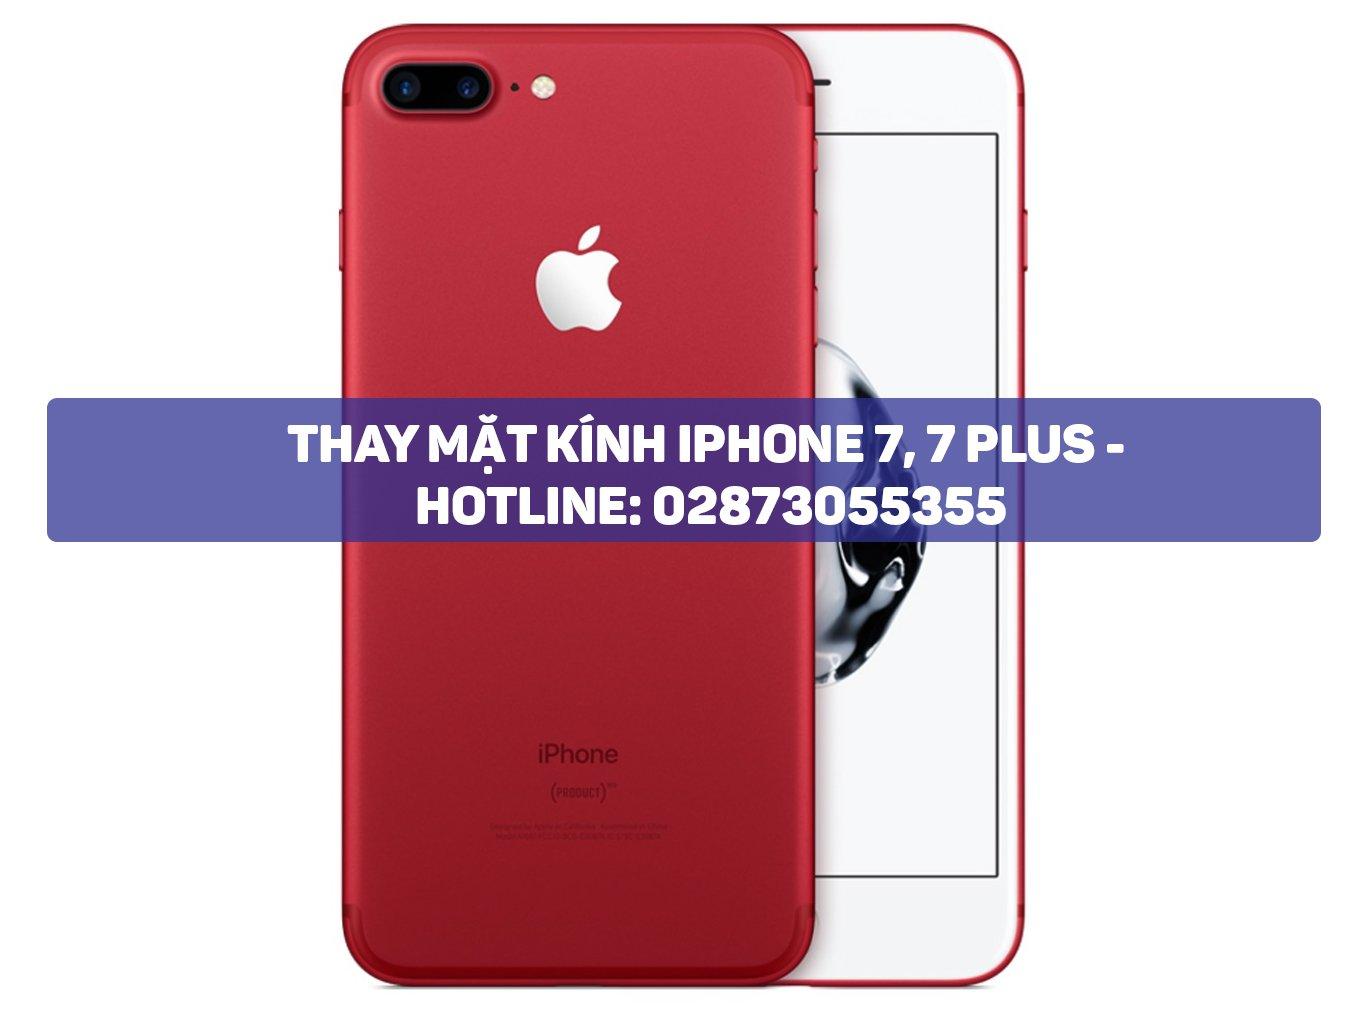 thay-mat-kinh-iphone-7-7-plus-2